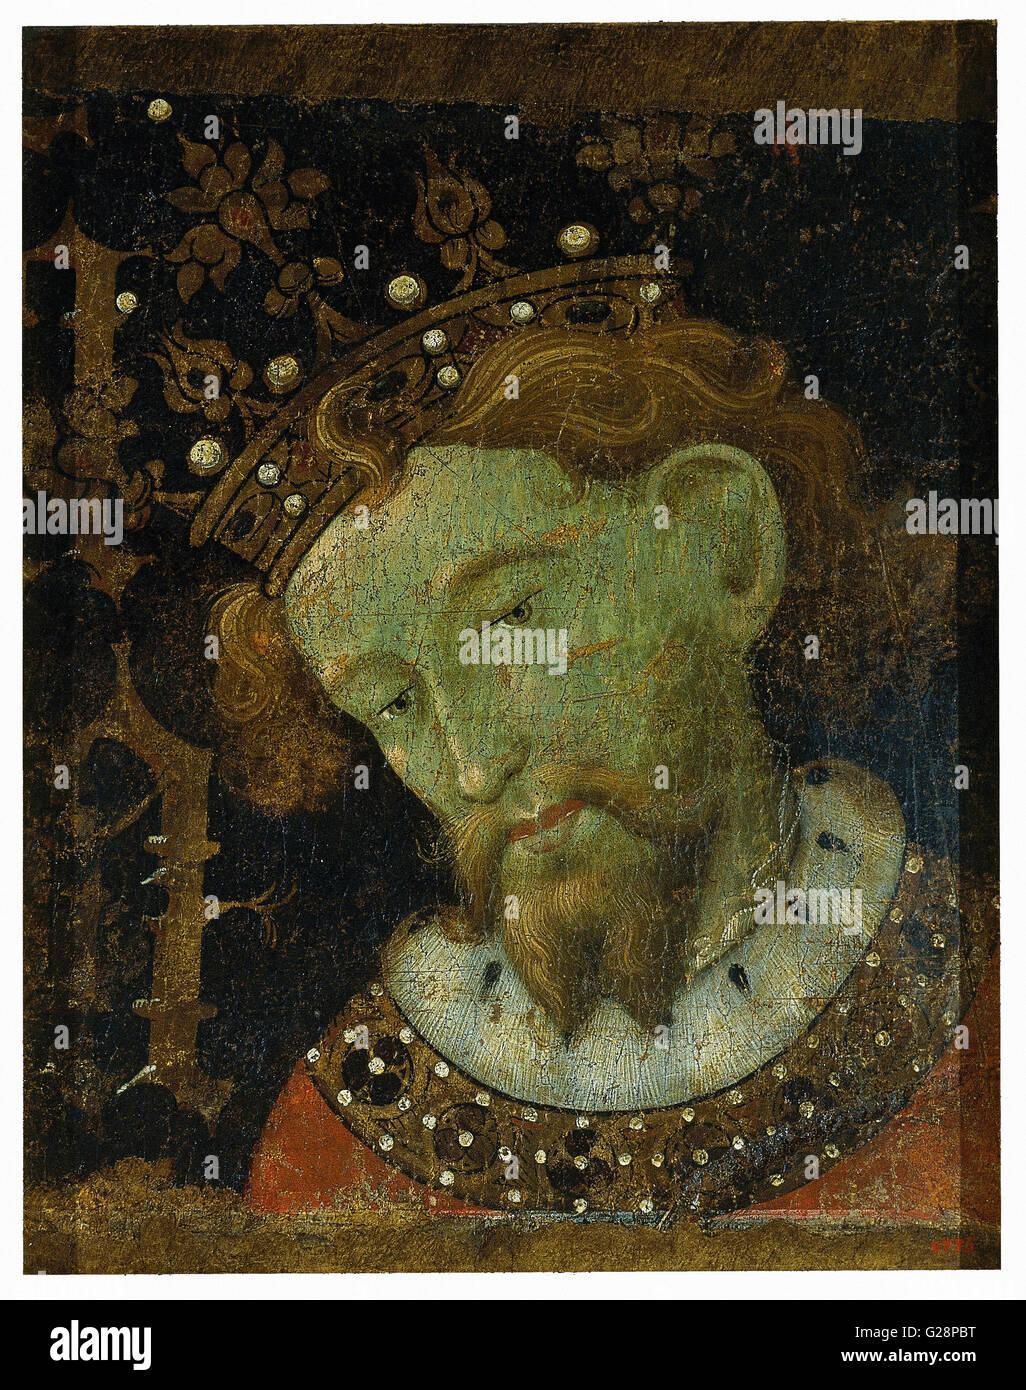 Jaume Mateu - Alfons III the Liberal  - MNAC - Barcelona - Stock Image